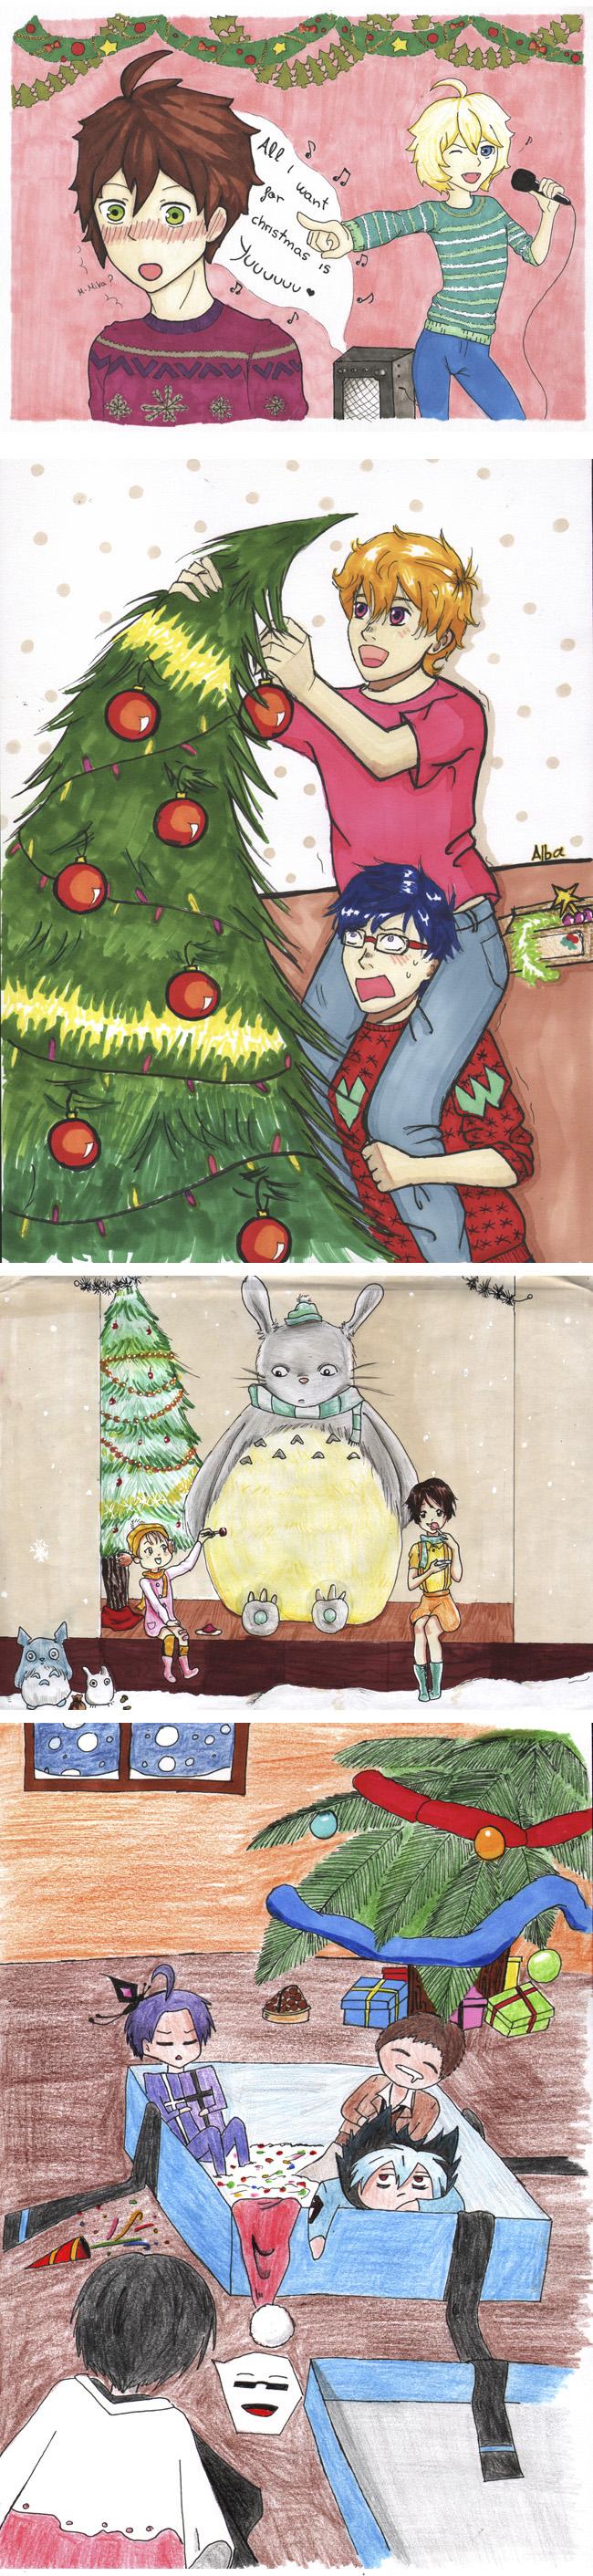 curso-manga-comic-fanarts-navidad-2016-academiac10-madrid